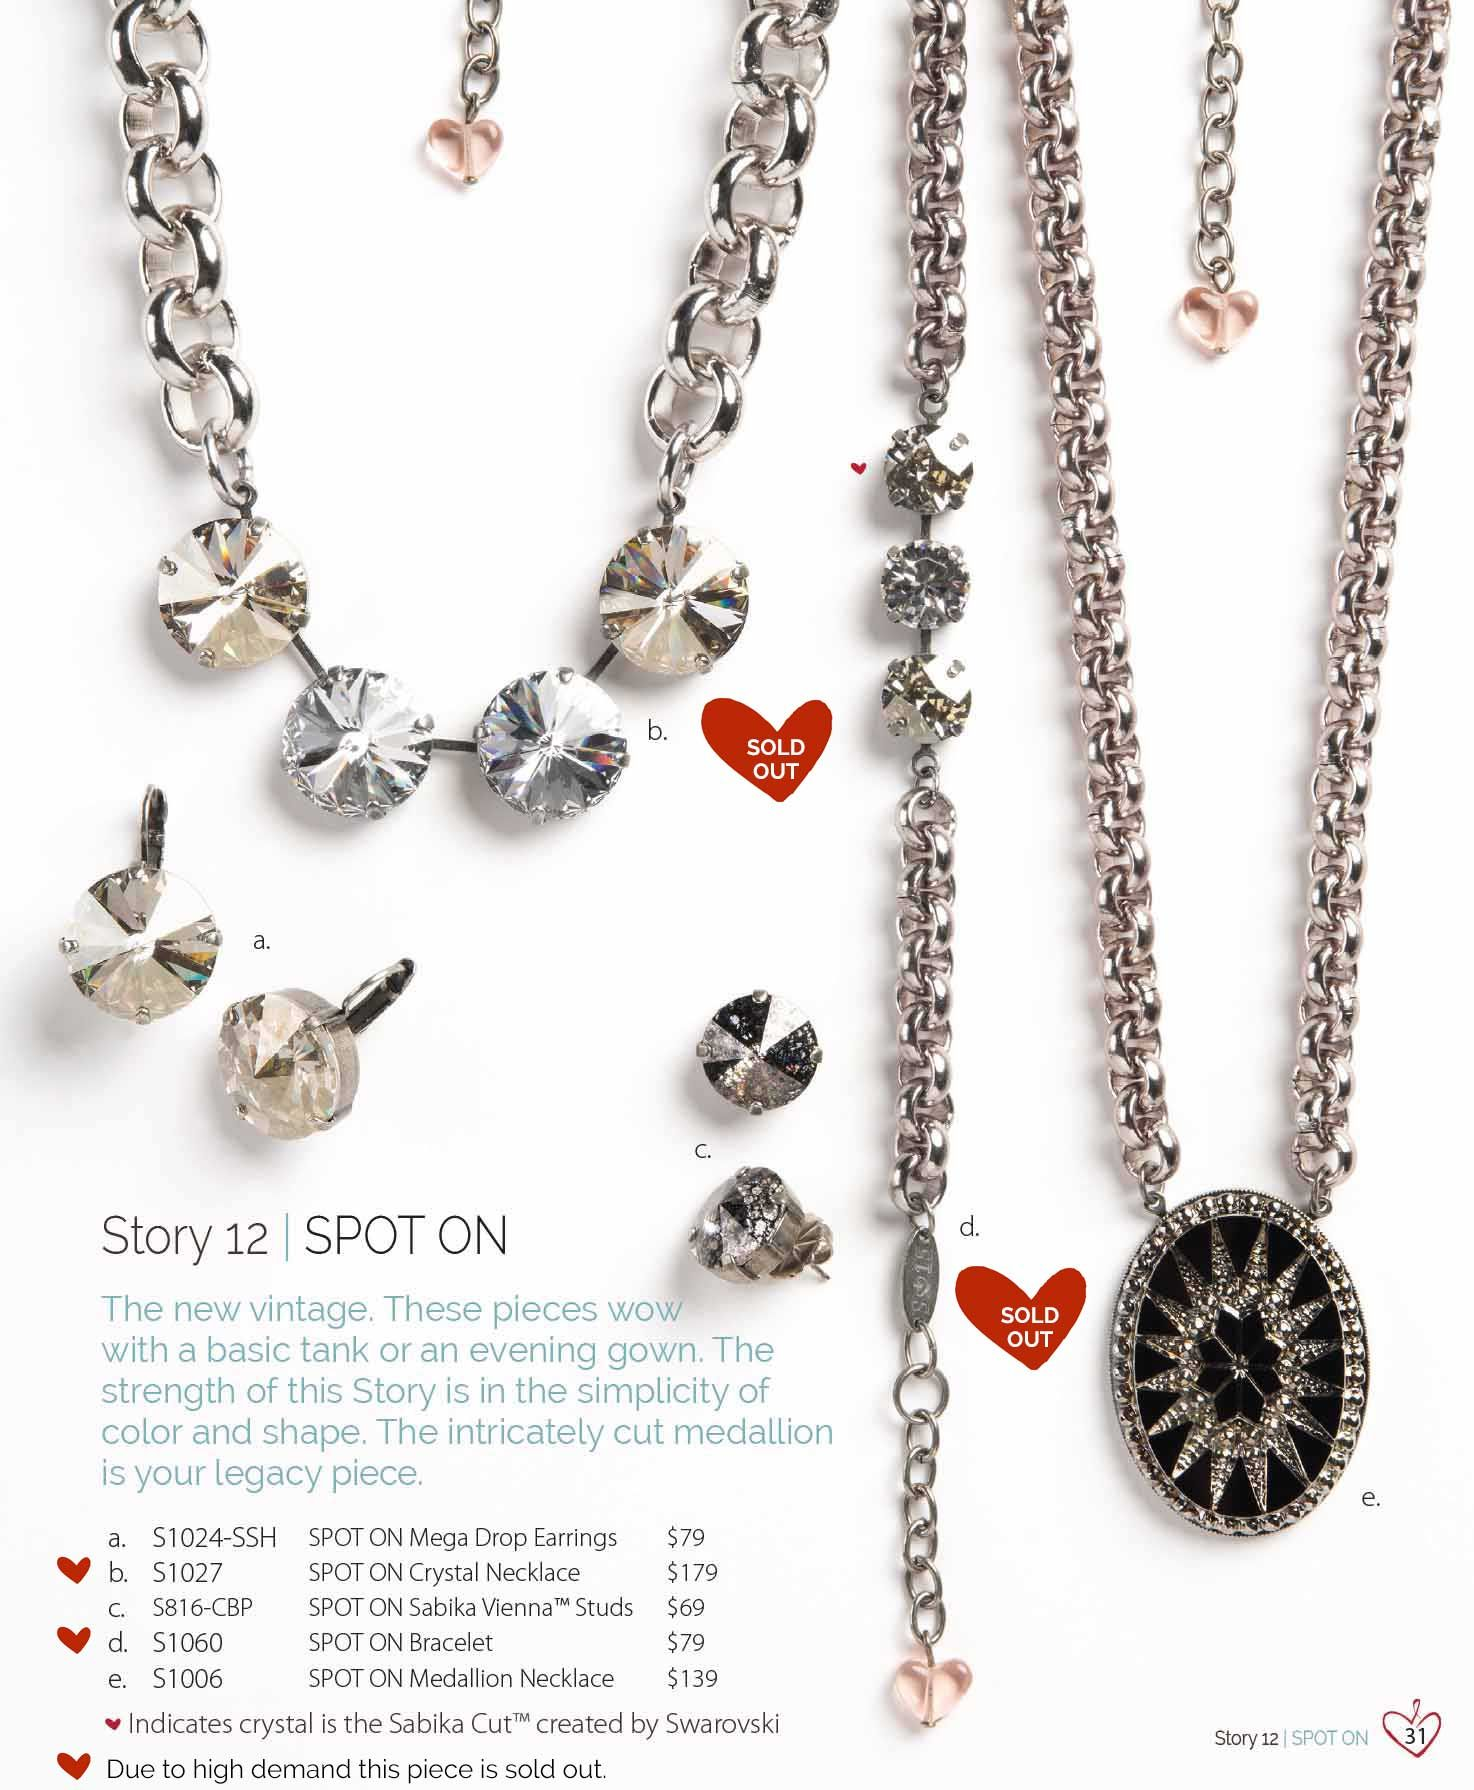 Sabika look necklace - Sabika Spring Summer 2015 Collection Story 4 Vintage Craft She Sells Sabika Gmail Com Sabikalove Sabika S S 2015 Pinterest Spring Summer 2015